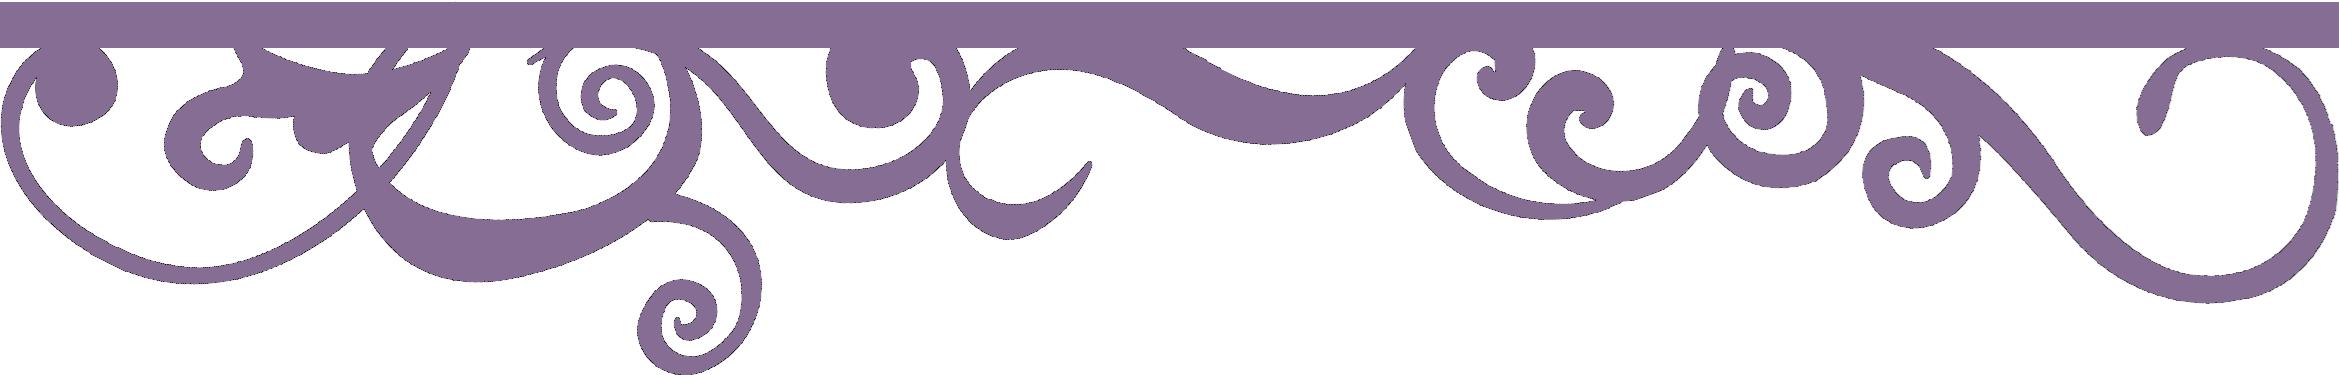 purpleswirl-flip.png